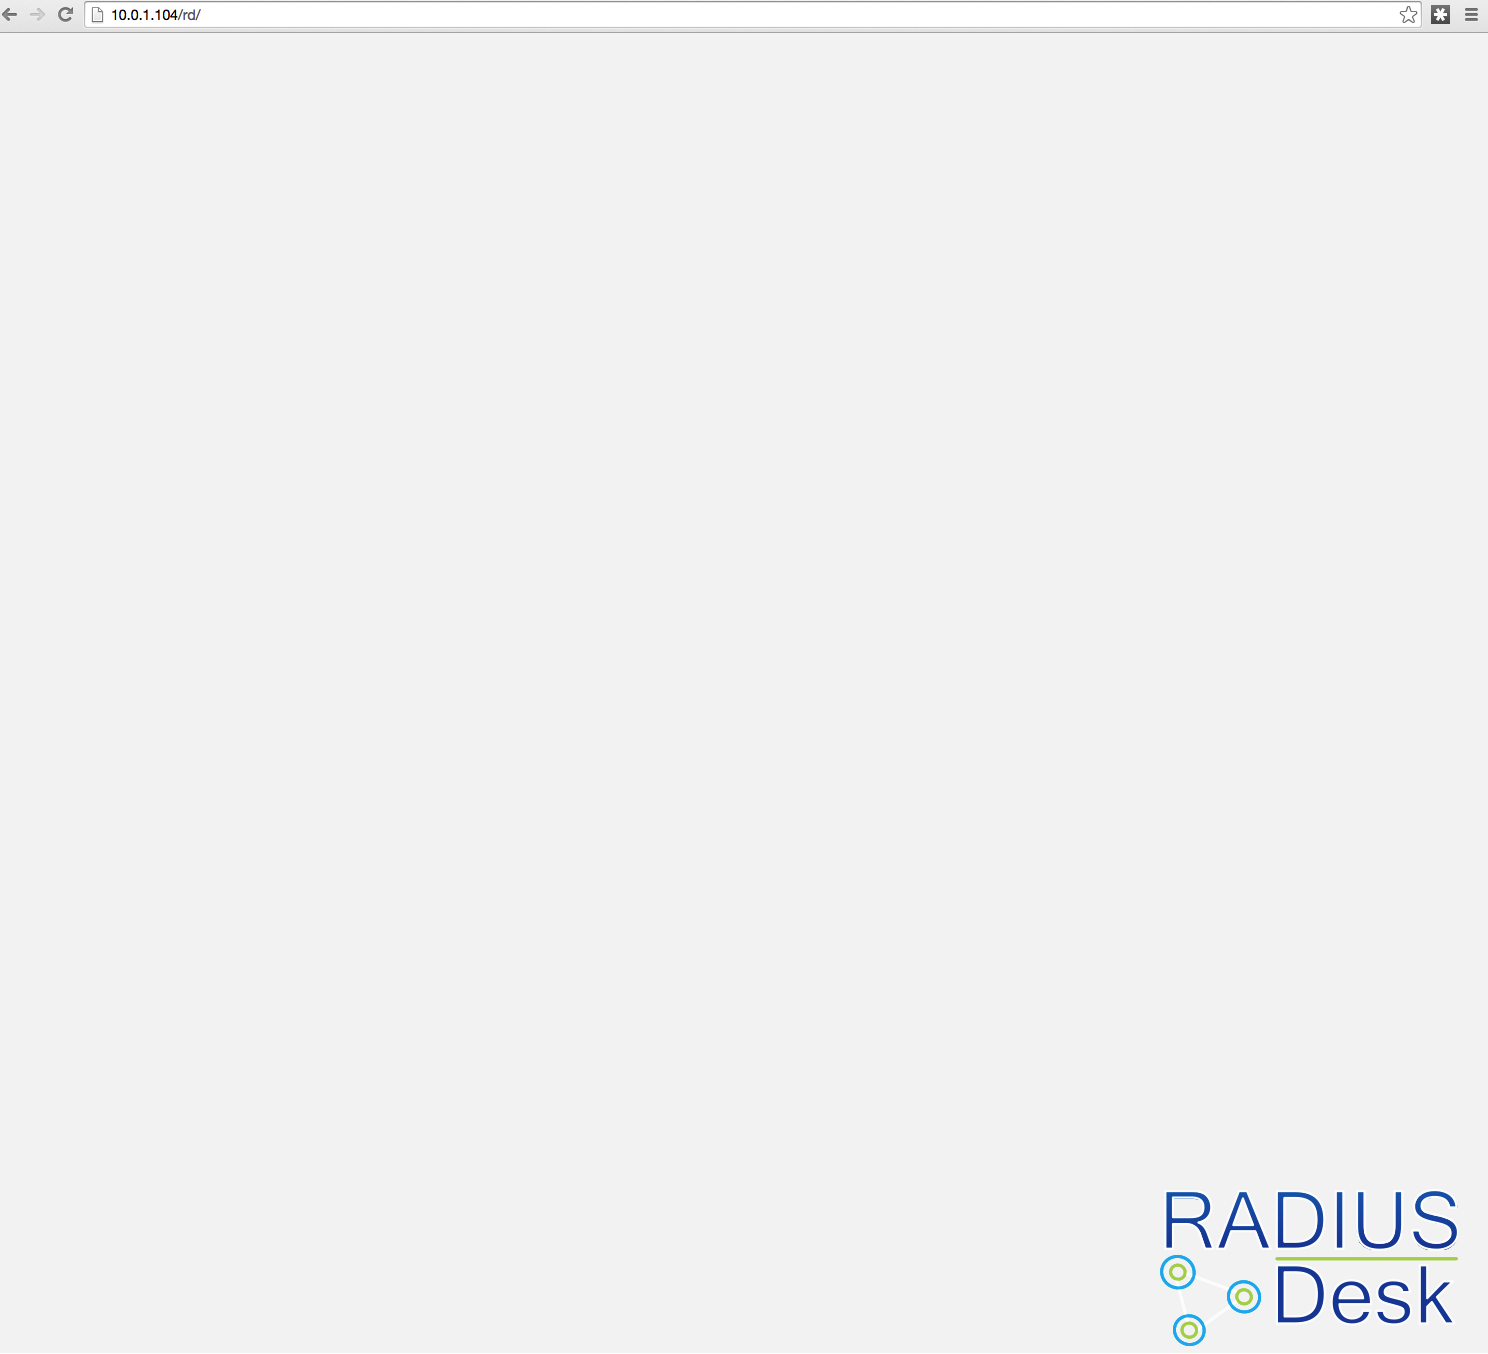 4669b777b7407 RADIUSdesk   Discussion   Help Bugs  Radius desk main page loading ...